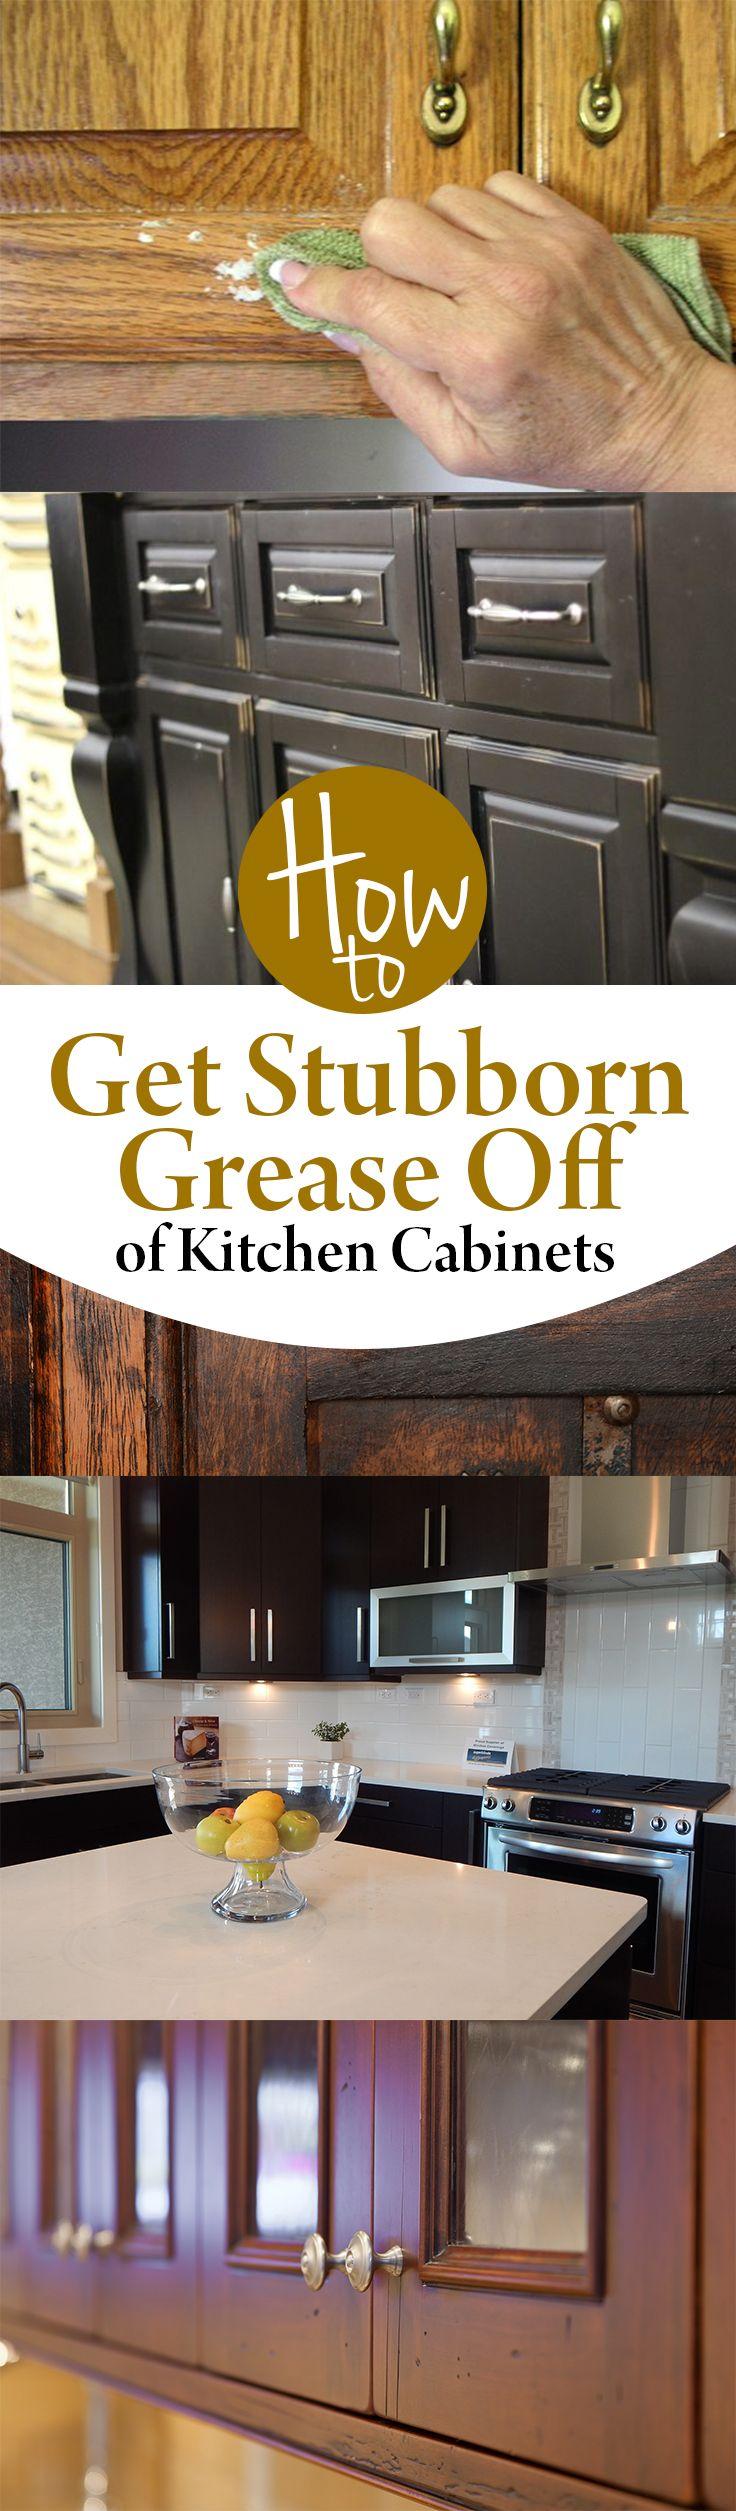 cleaning kitchen cabinets cleaning kitchen cabinets 25 best ideas about Cleaning Kitchen Cabinets on Pinterest Cabinet cleaner Cleaning cabinets and Kitchen cabinet cleaning